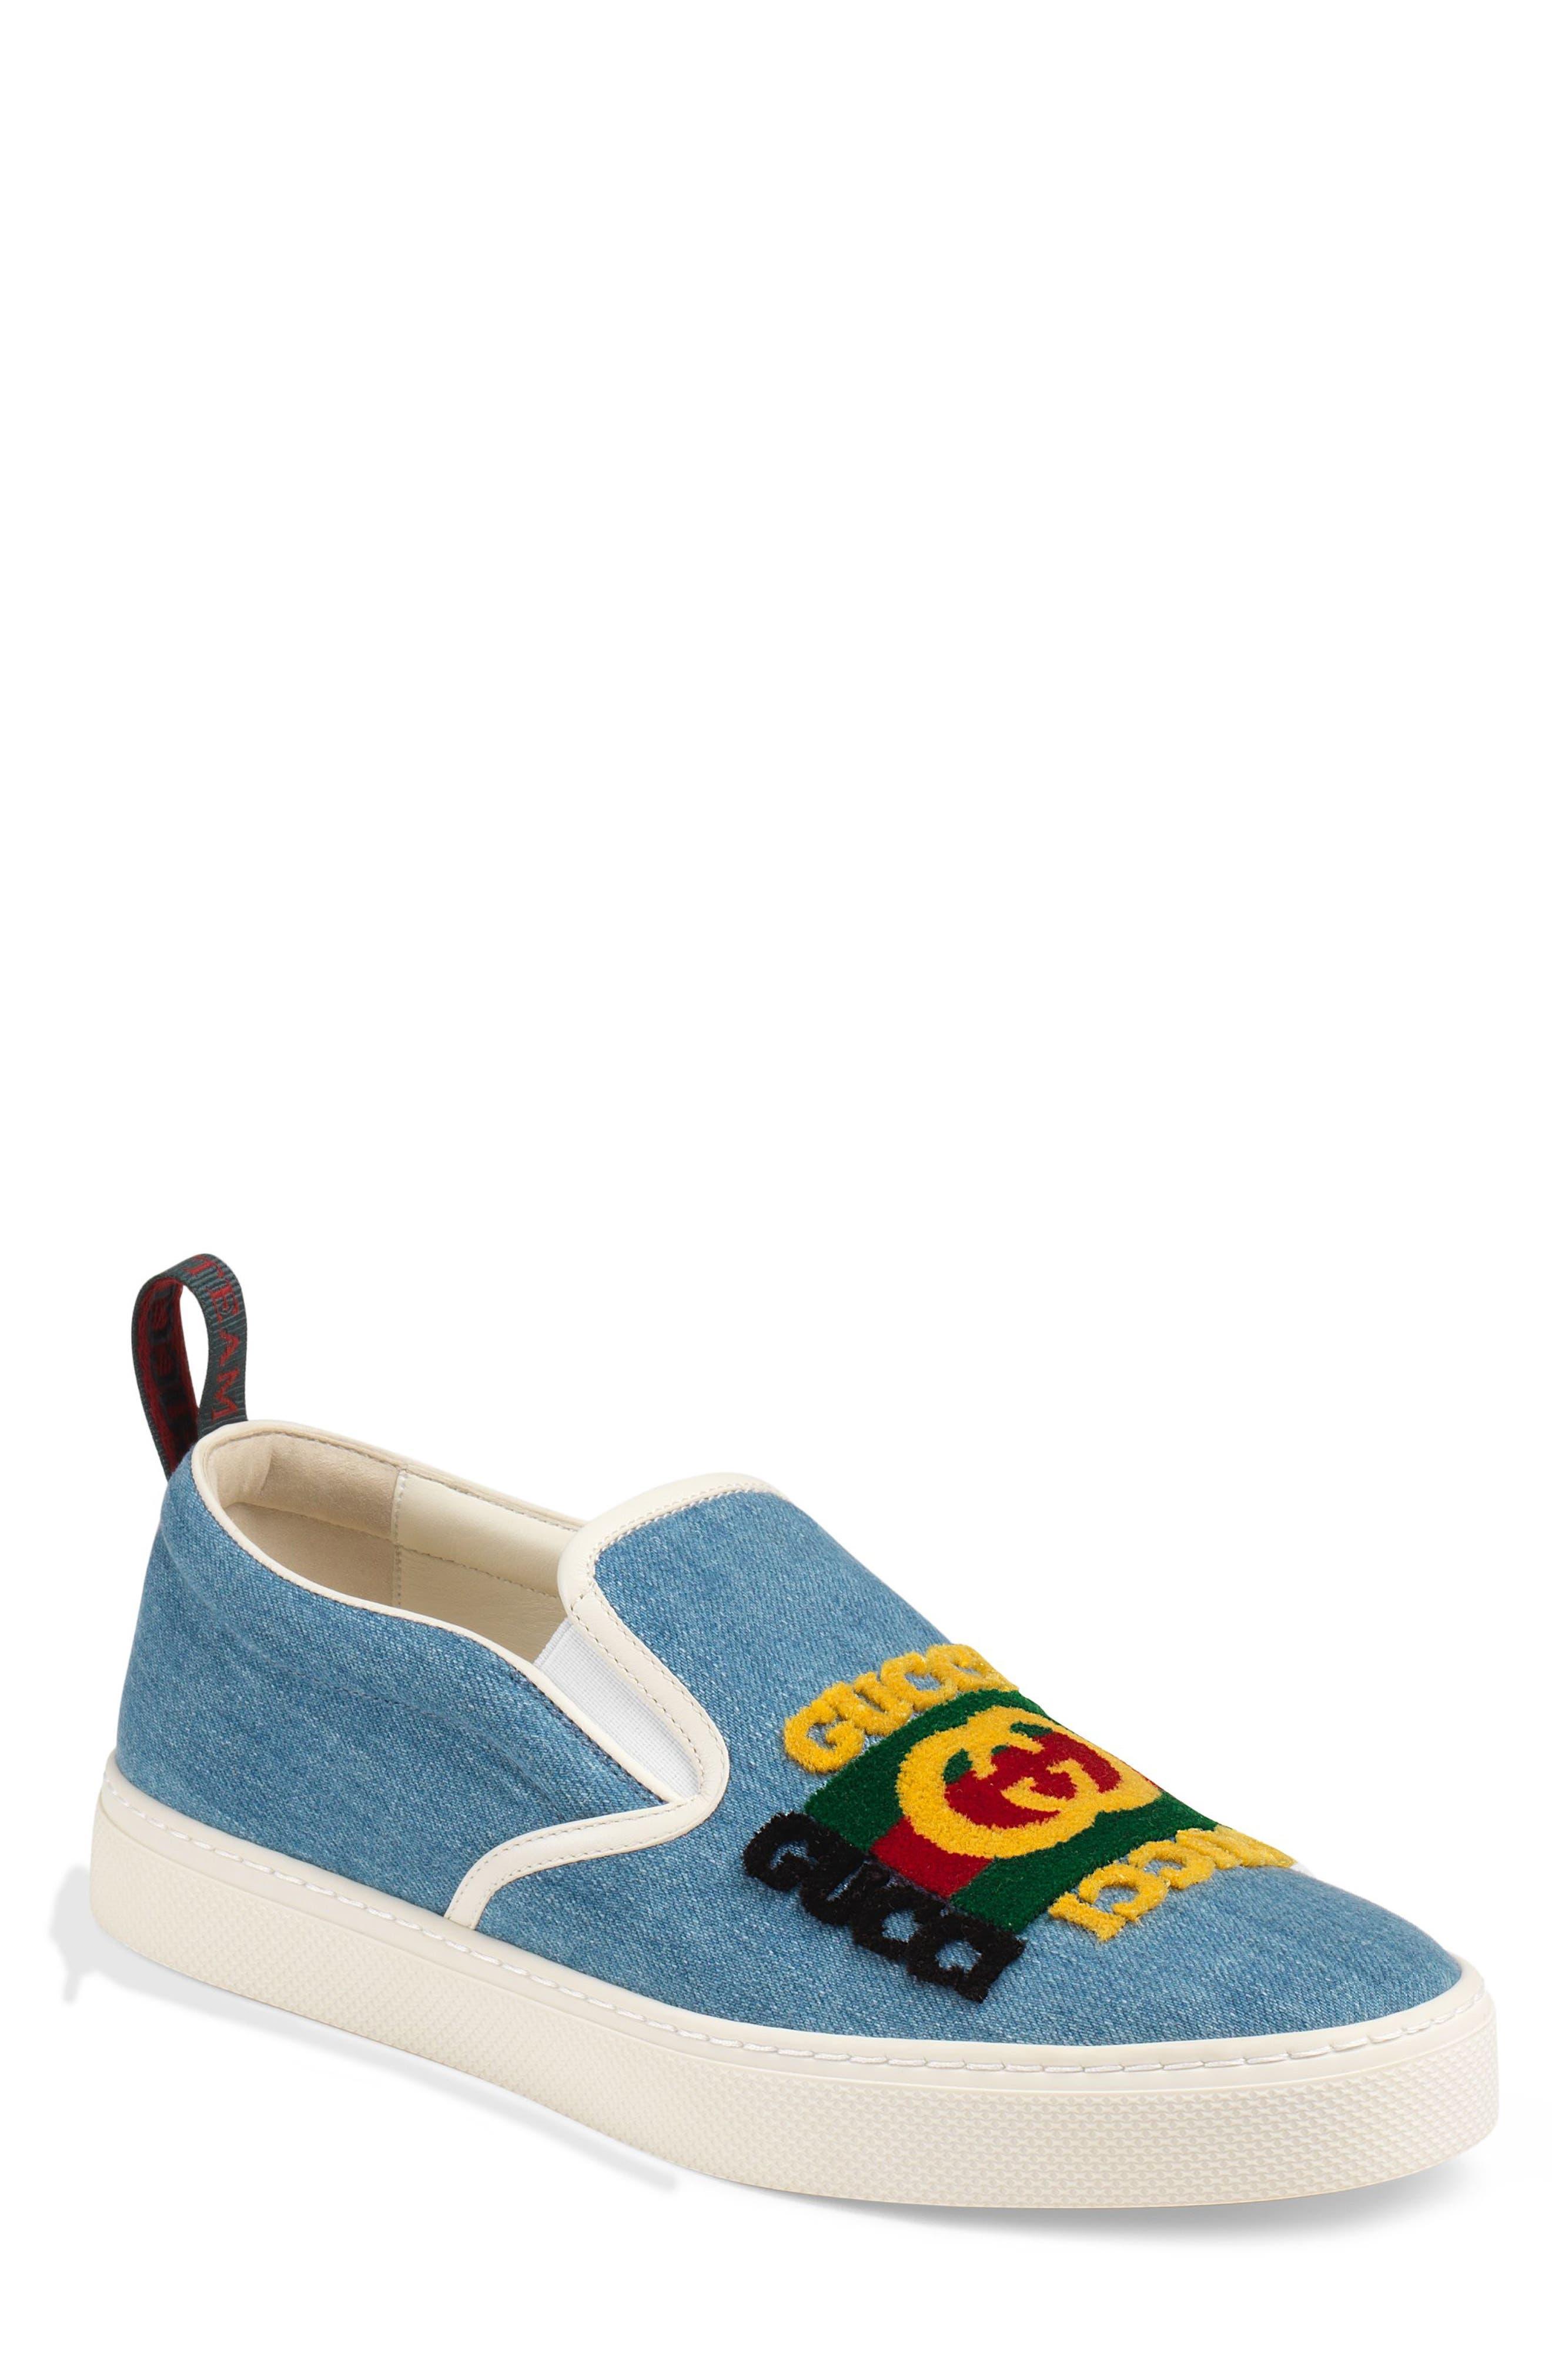 GUCCI, Dublin Slip-On Sneaker, Main thumbnail 1, color, BLUE/ BLACK